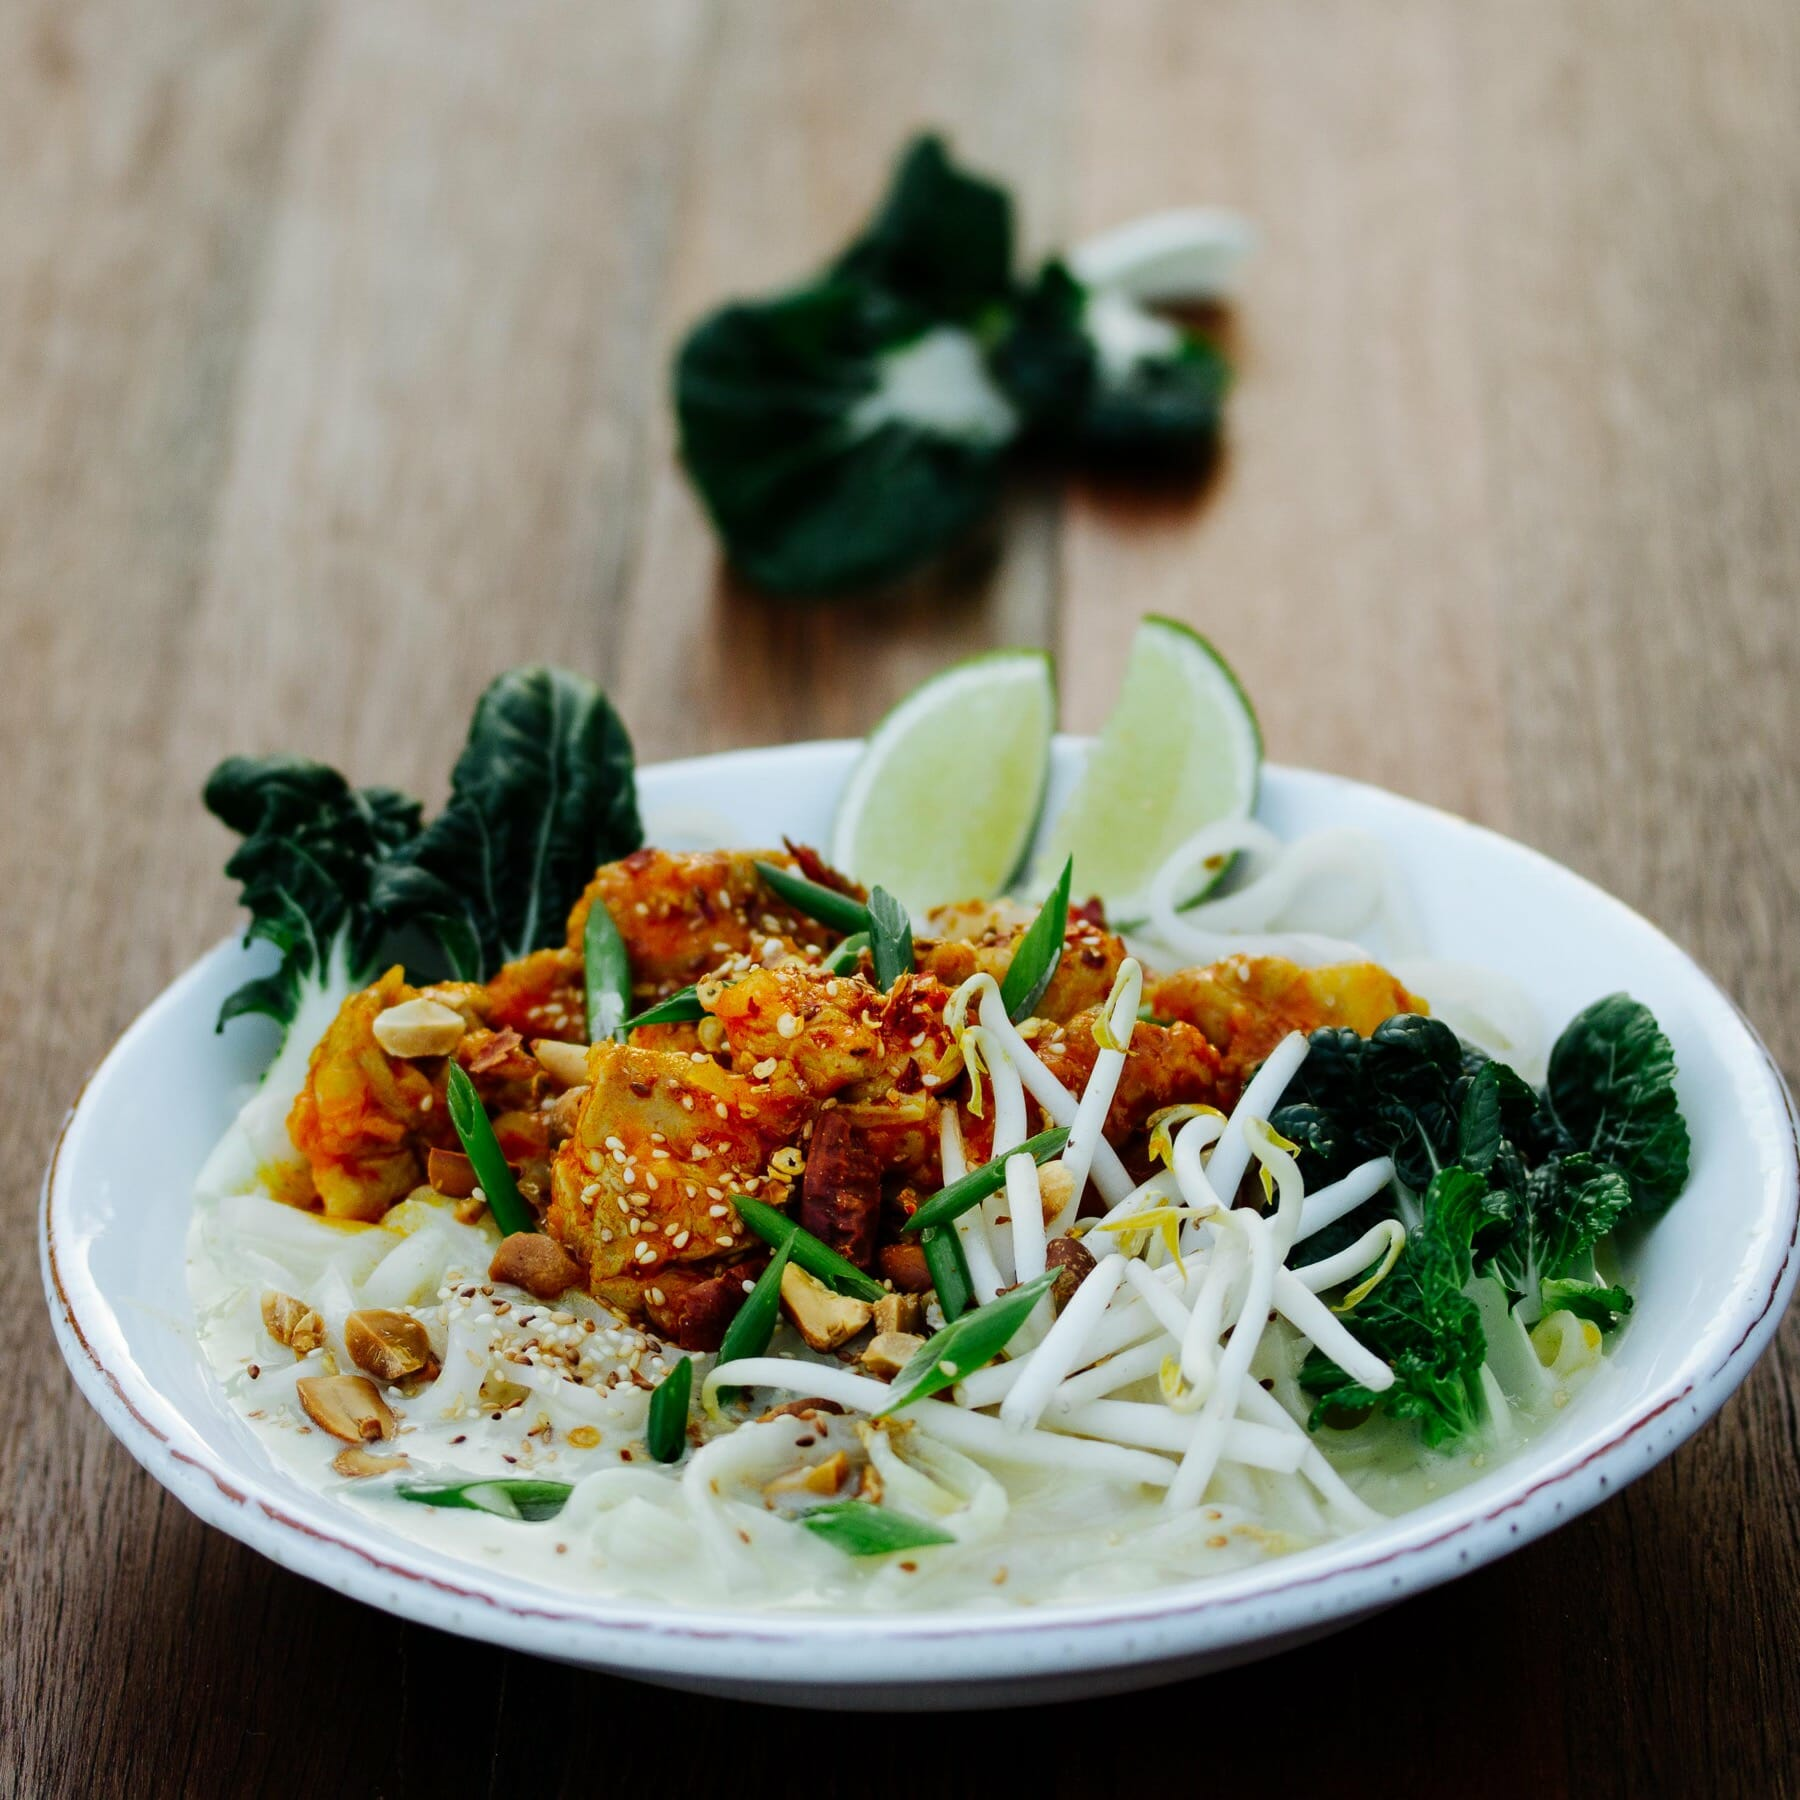 Burmesische Nudelsuppe mit Shan Tofu - Shan Khauk Swe To Hpu Nway